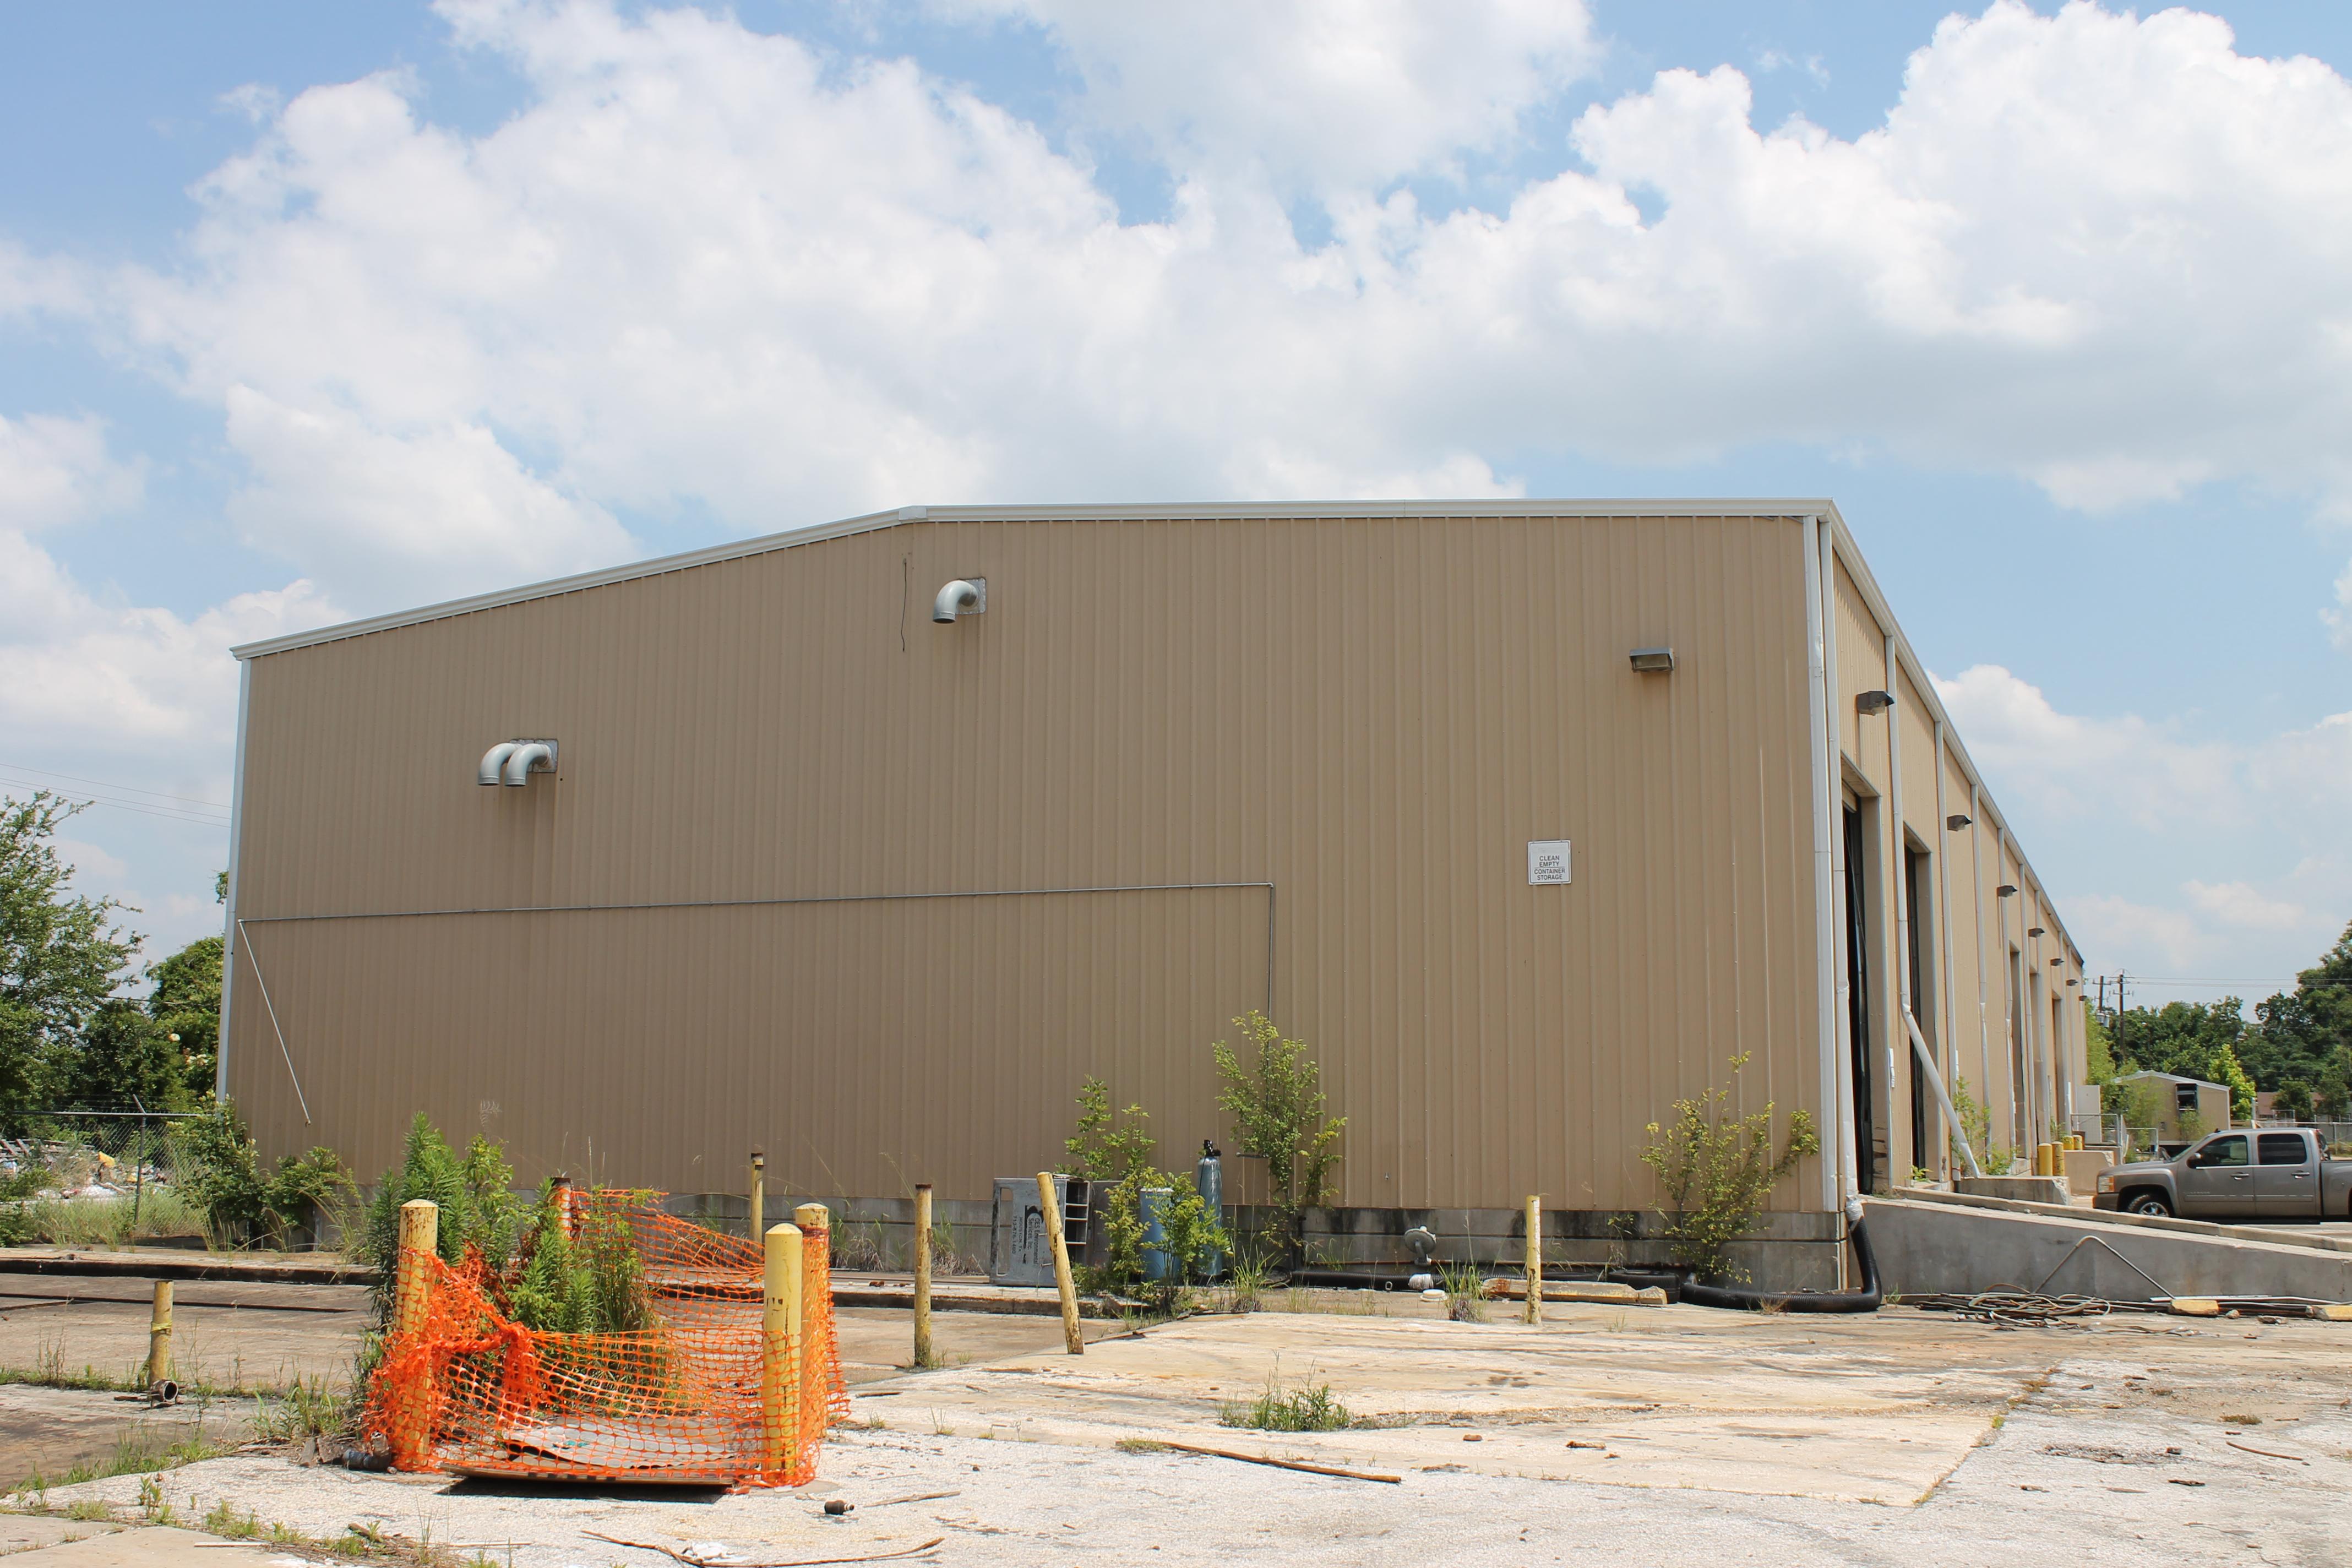 Lot 36 - METAL BUILDING, BOLT TOGETHER CONSTRUCTION, 275'L. x 80'W. x 26' center ht., 24' eave ht., (7)